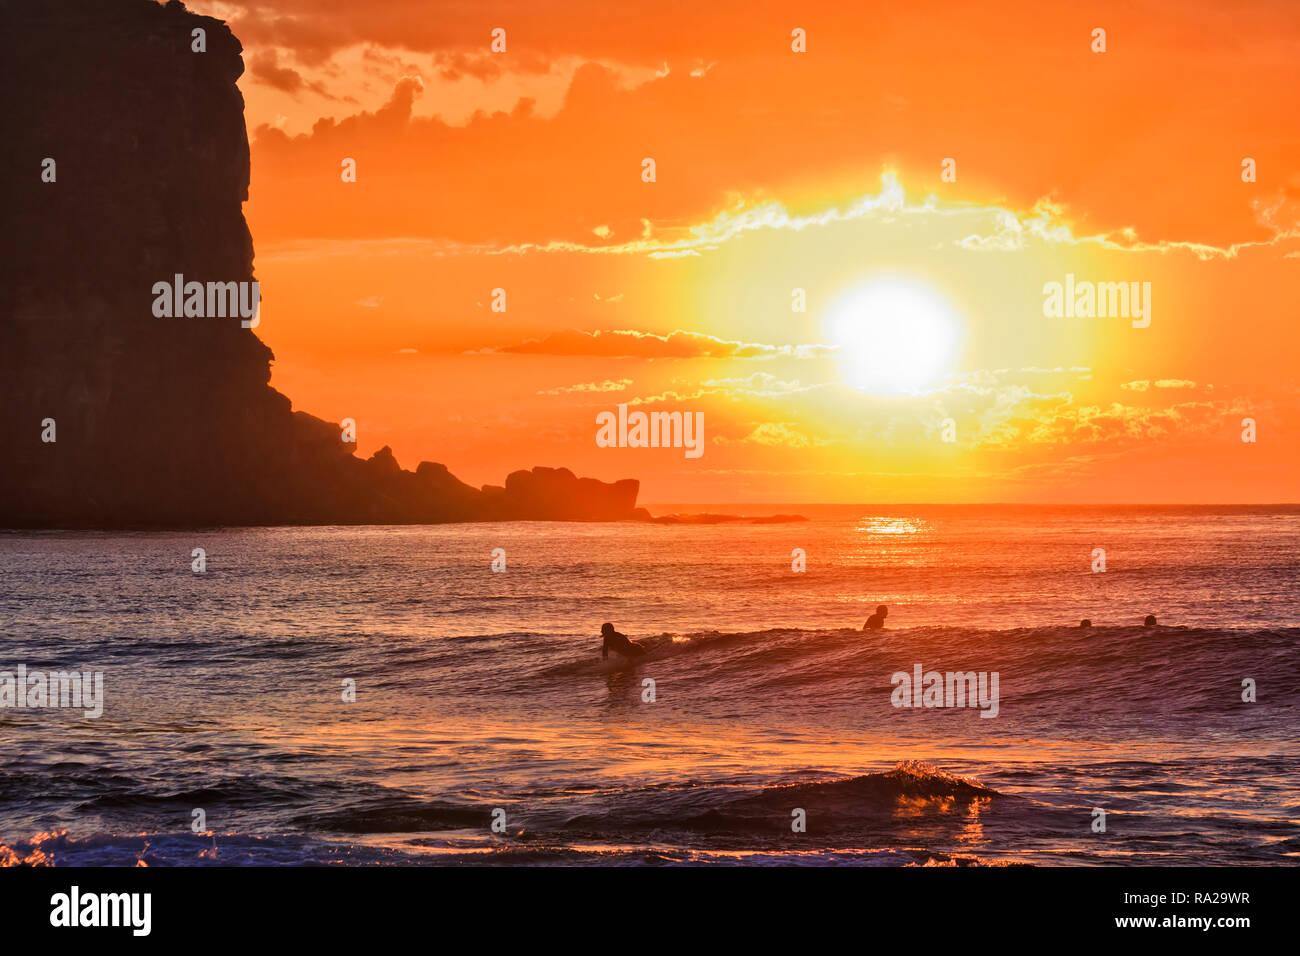 Bloody orange sun over sea horizon flooding rolling waves with windsurfers off Avalon beach in Australia Sydney Northern beaches on Pacific coast. - Stock Image